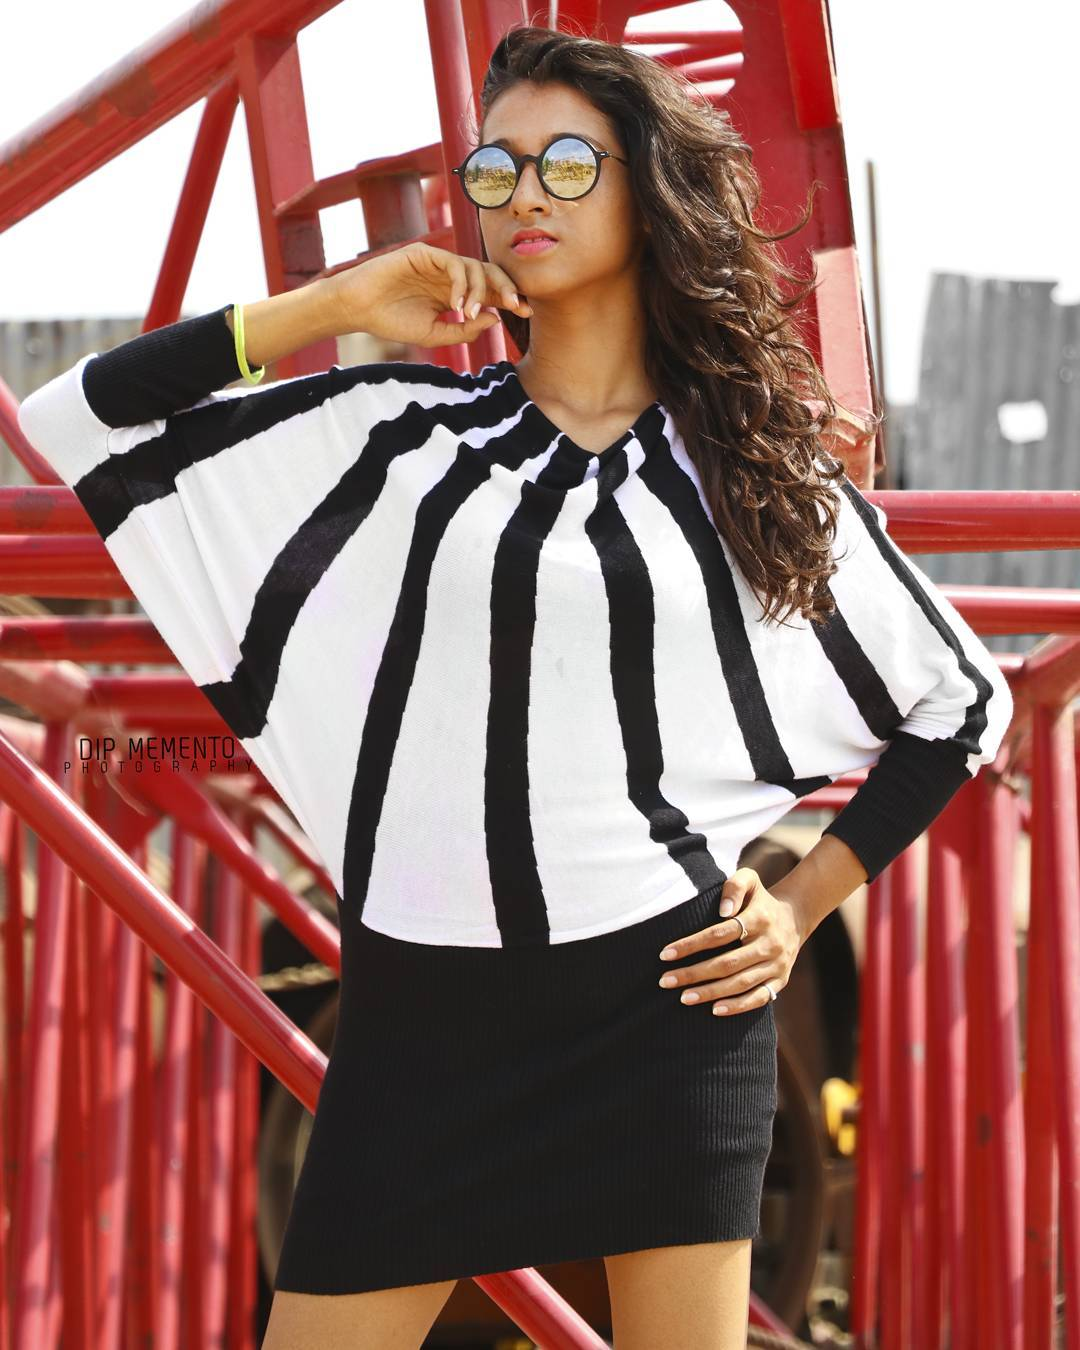 INFRAME : AESHA SHAH  #PortraitVision #ahmedabadfashion #ahmedabadfashionblogger  #ahmedabadfashionpalette #printshoot #womensportraiture #beautifulwomen #girlsportrait #photoholic #portfolioshoot  #folioshoot #catalogshoot #girlsfashions #trial #portraitphotography #portrait #fashionphotography #FashionShoot #ahmedabad #photography #picoftheday #modelpose #modelphotography #AhmedabadPhotography #ahmedabad #indianfashionblogger #fashionblogger  #ahmedabaddiaries #urbanfashion #shoutout